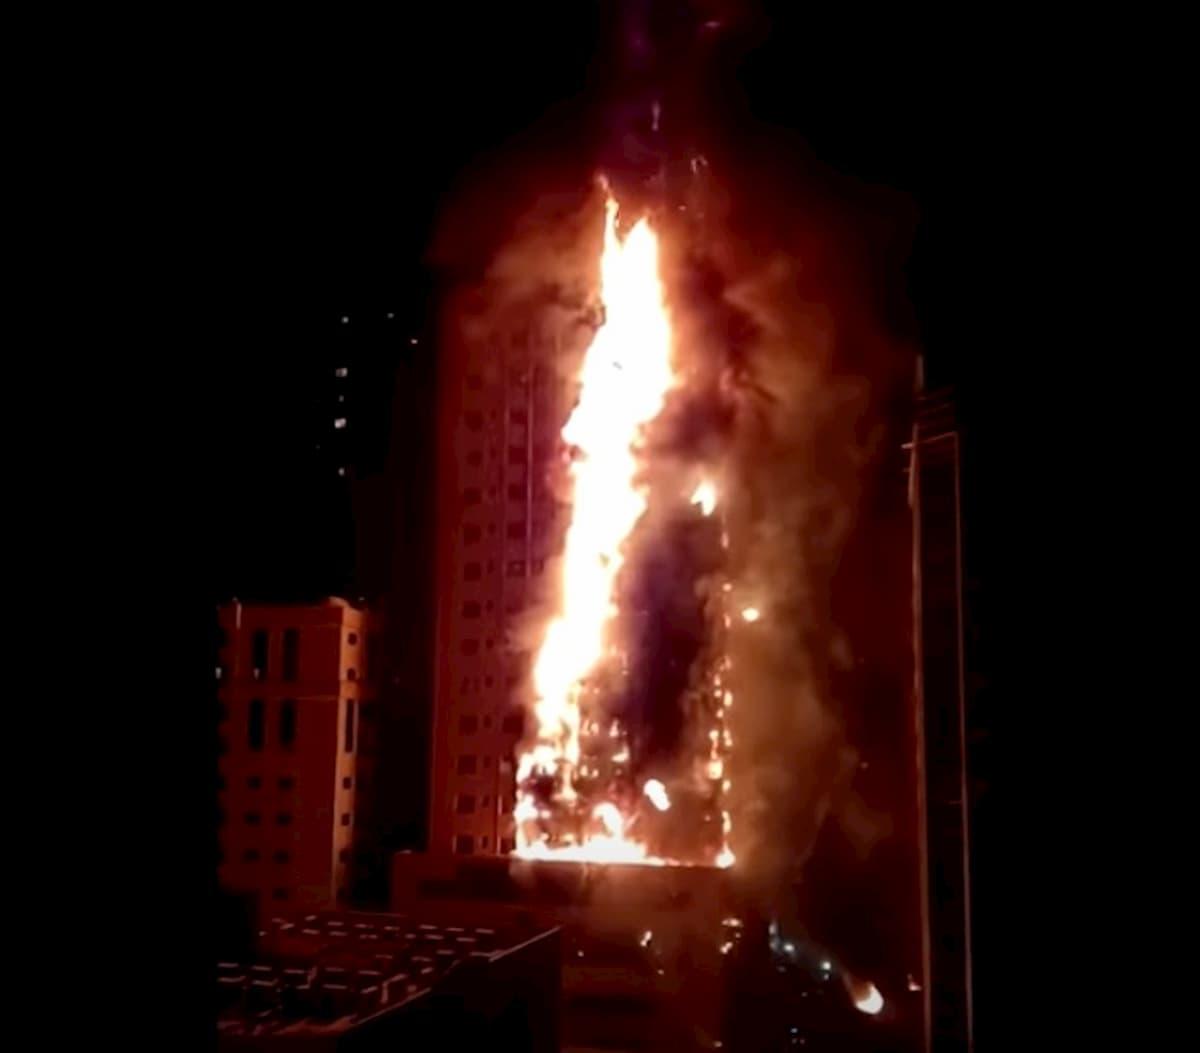 Emirati Arabi, incendio in un grattacielo residenziale a Sharjah VIDEO